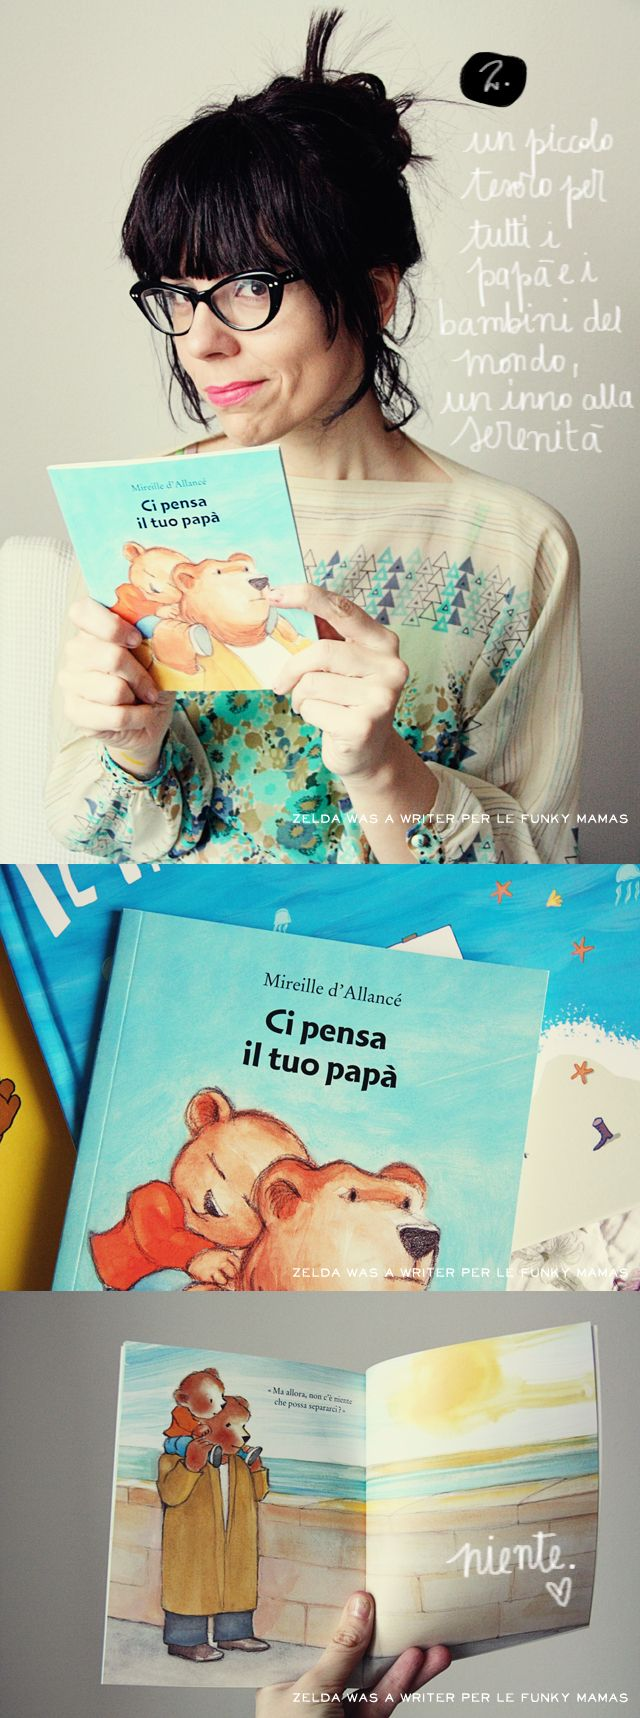 Festa del papà - Ex Libris per LE FUNKY MAMAS